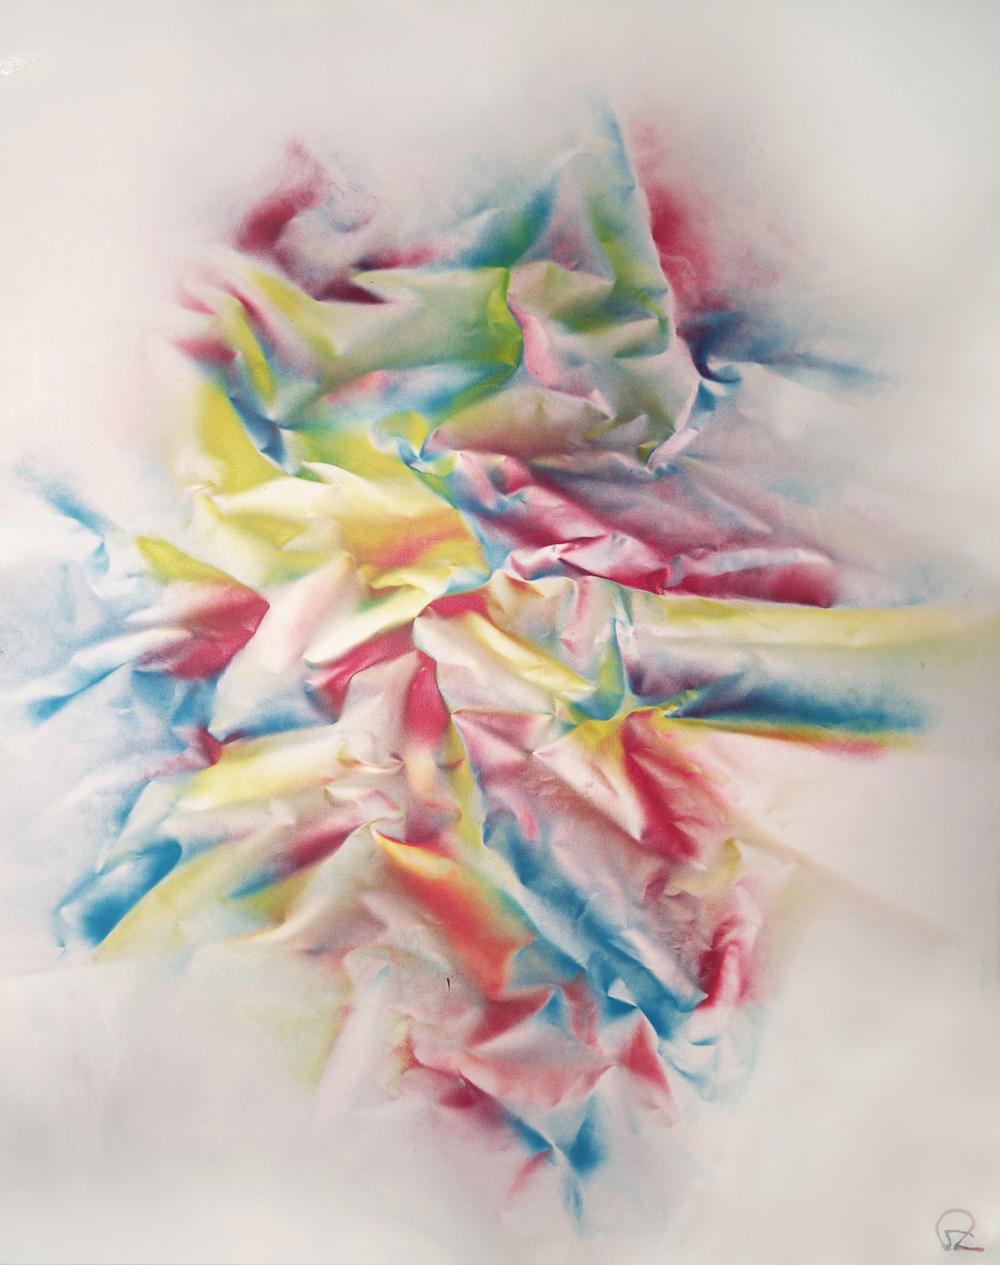 """Morphic Fields"" - Aerosol on canvas - 130cm x 104cm"